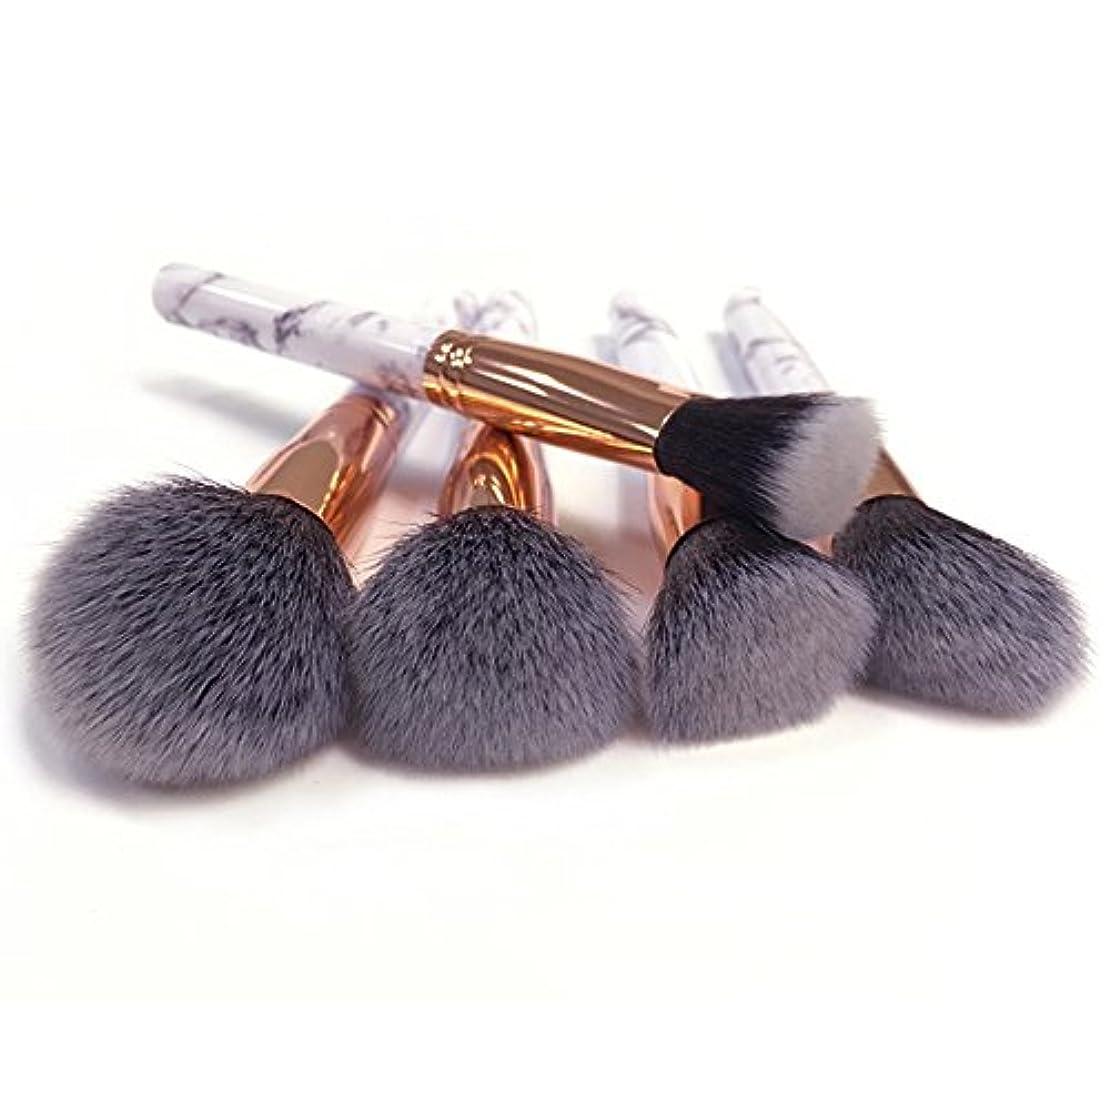 Akane 10本 大理石紋 超気質的 セート 多機能 柔らかい たっぷり 高級 優雅 綺麗 魅力 上等な使用感 激安 日常 仕事 おしゃれ Makeup Brush メイクアップブラシ